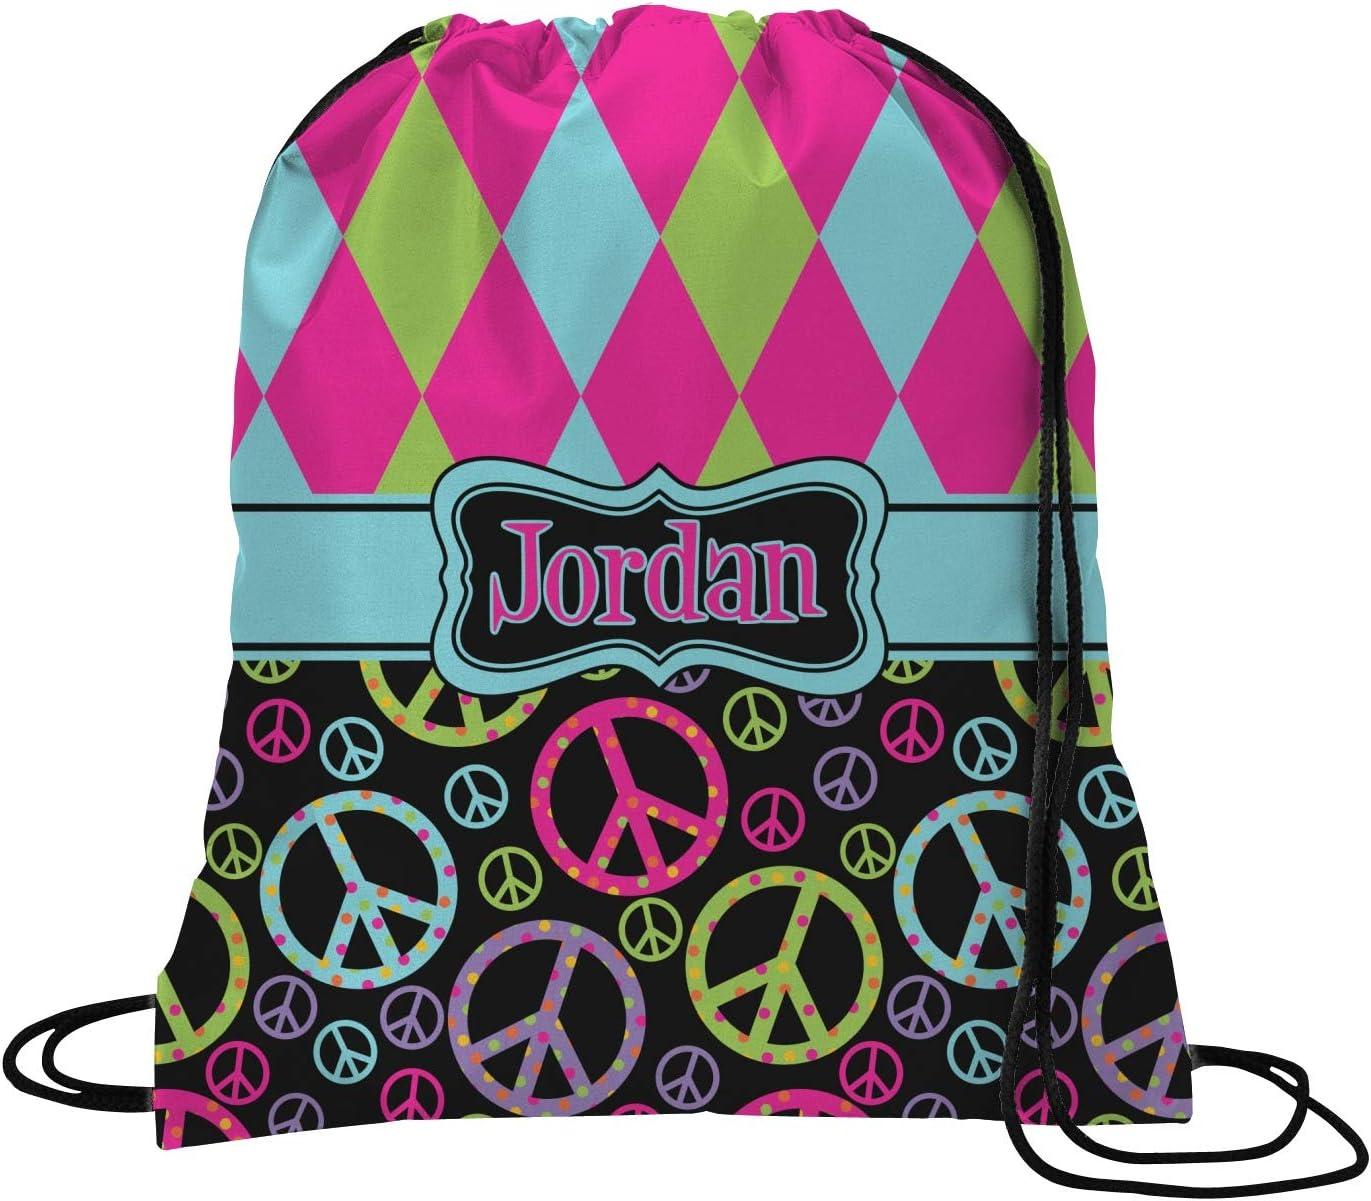 Personalized YouCustomizeIt Colorful Trellis Duffel Bag